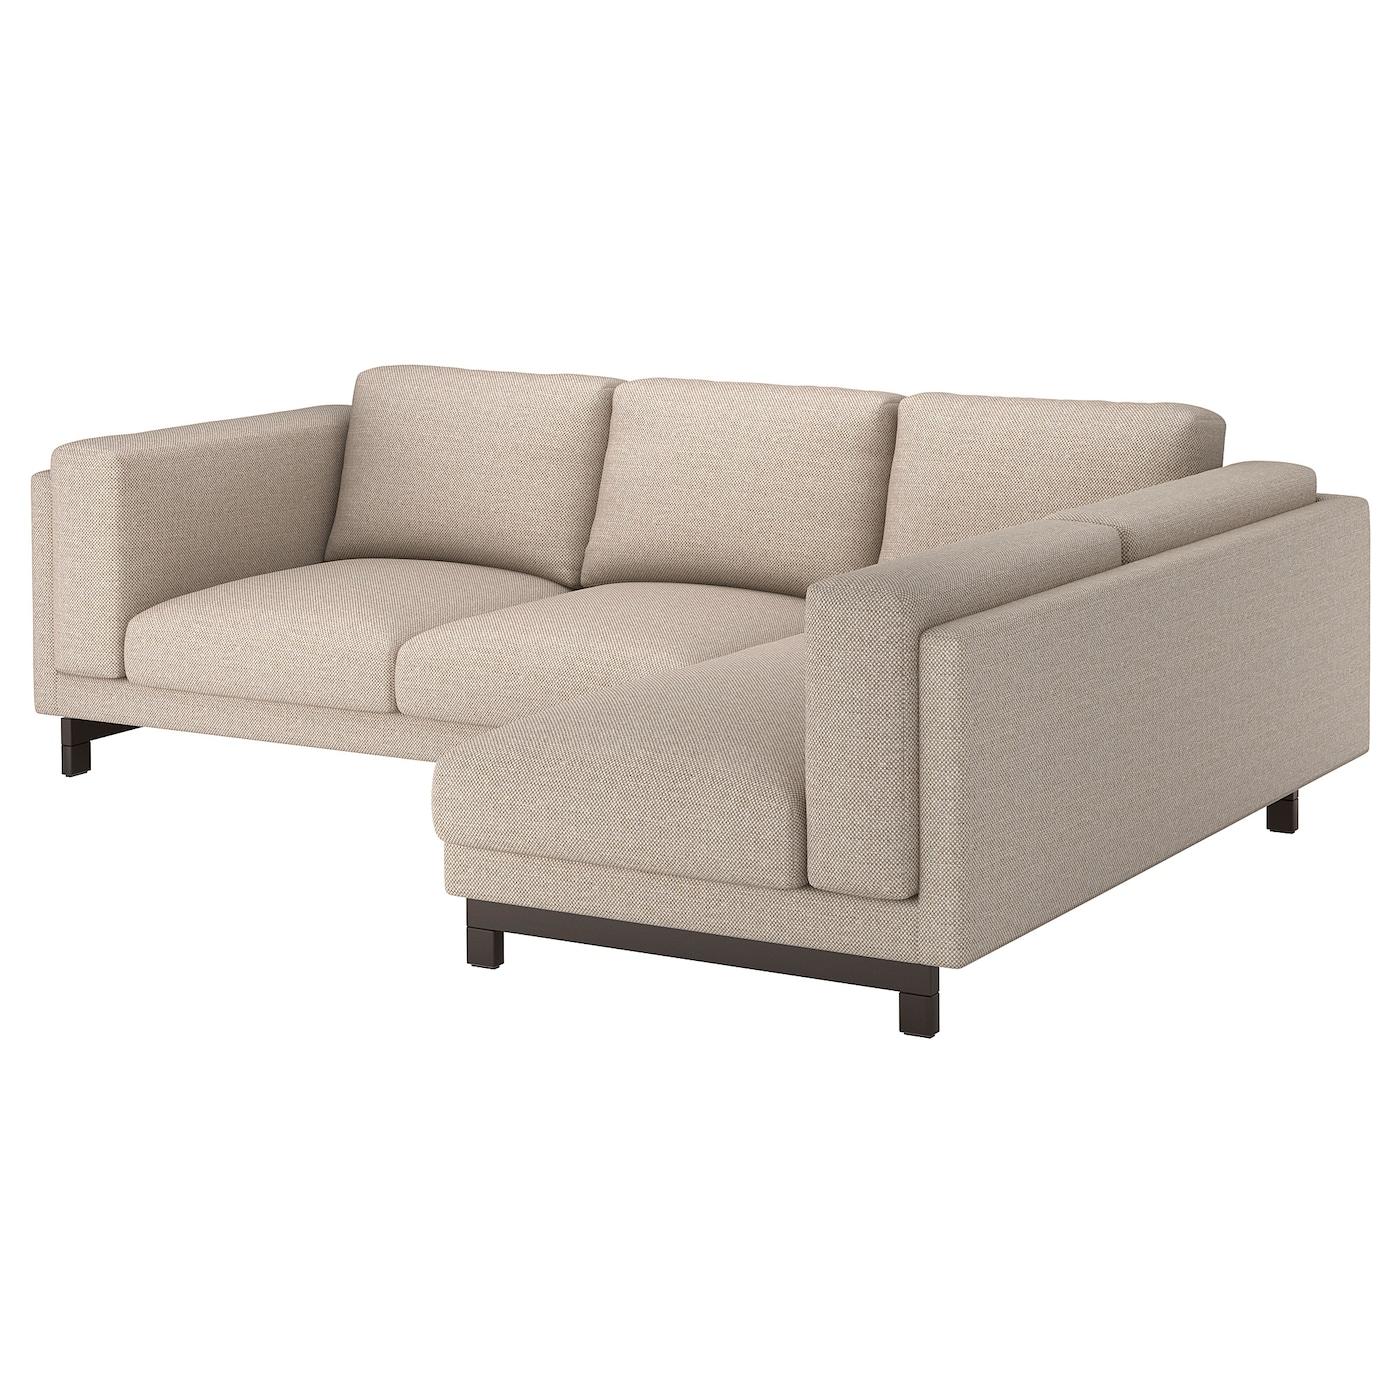 NOCKEBY 3-seat sofa With chaise longue, right/lejde dark beige/wood ...